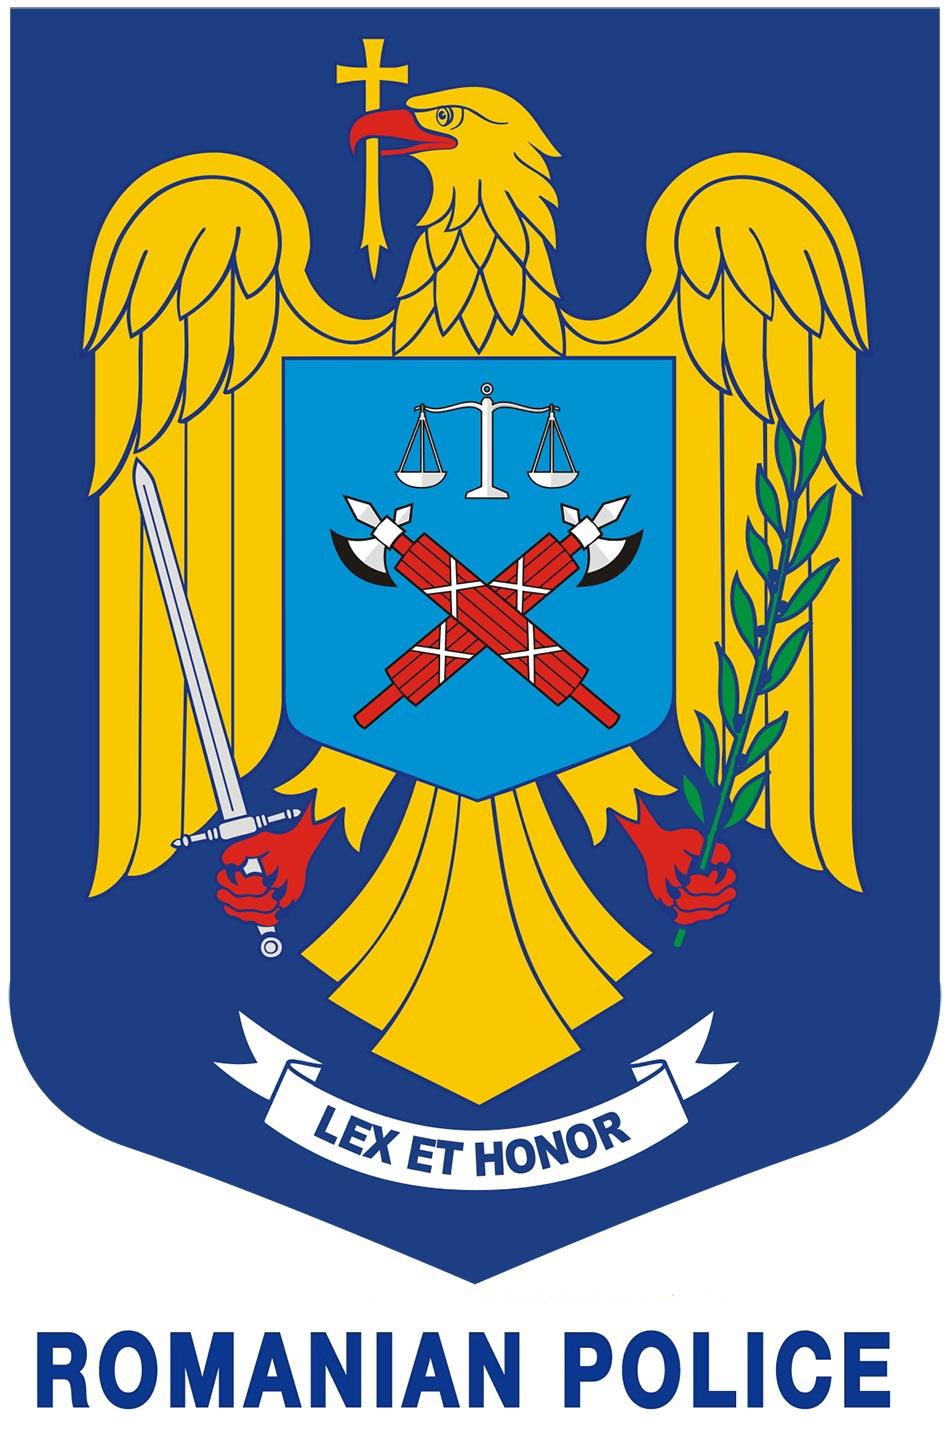 Zaštitni znak, grb i logo Romanian Police